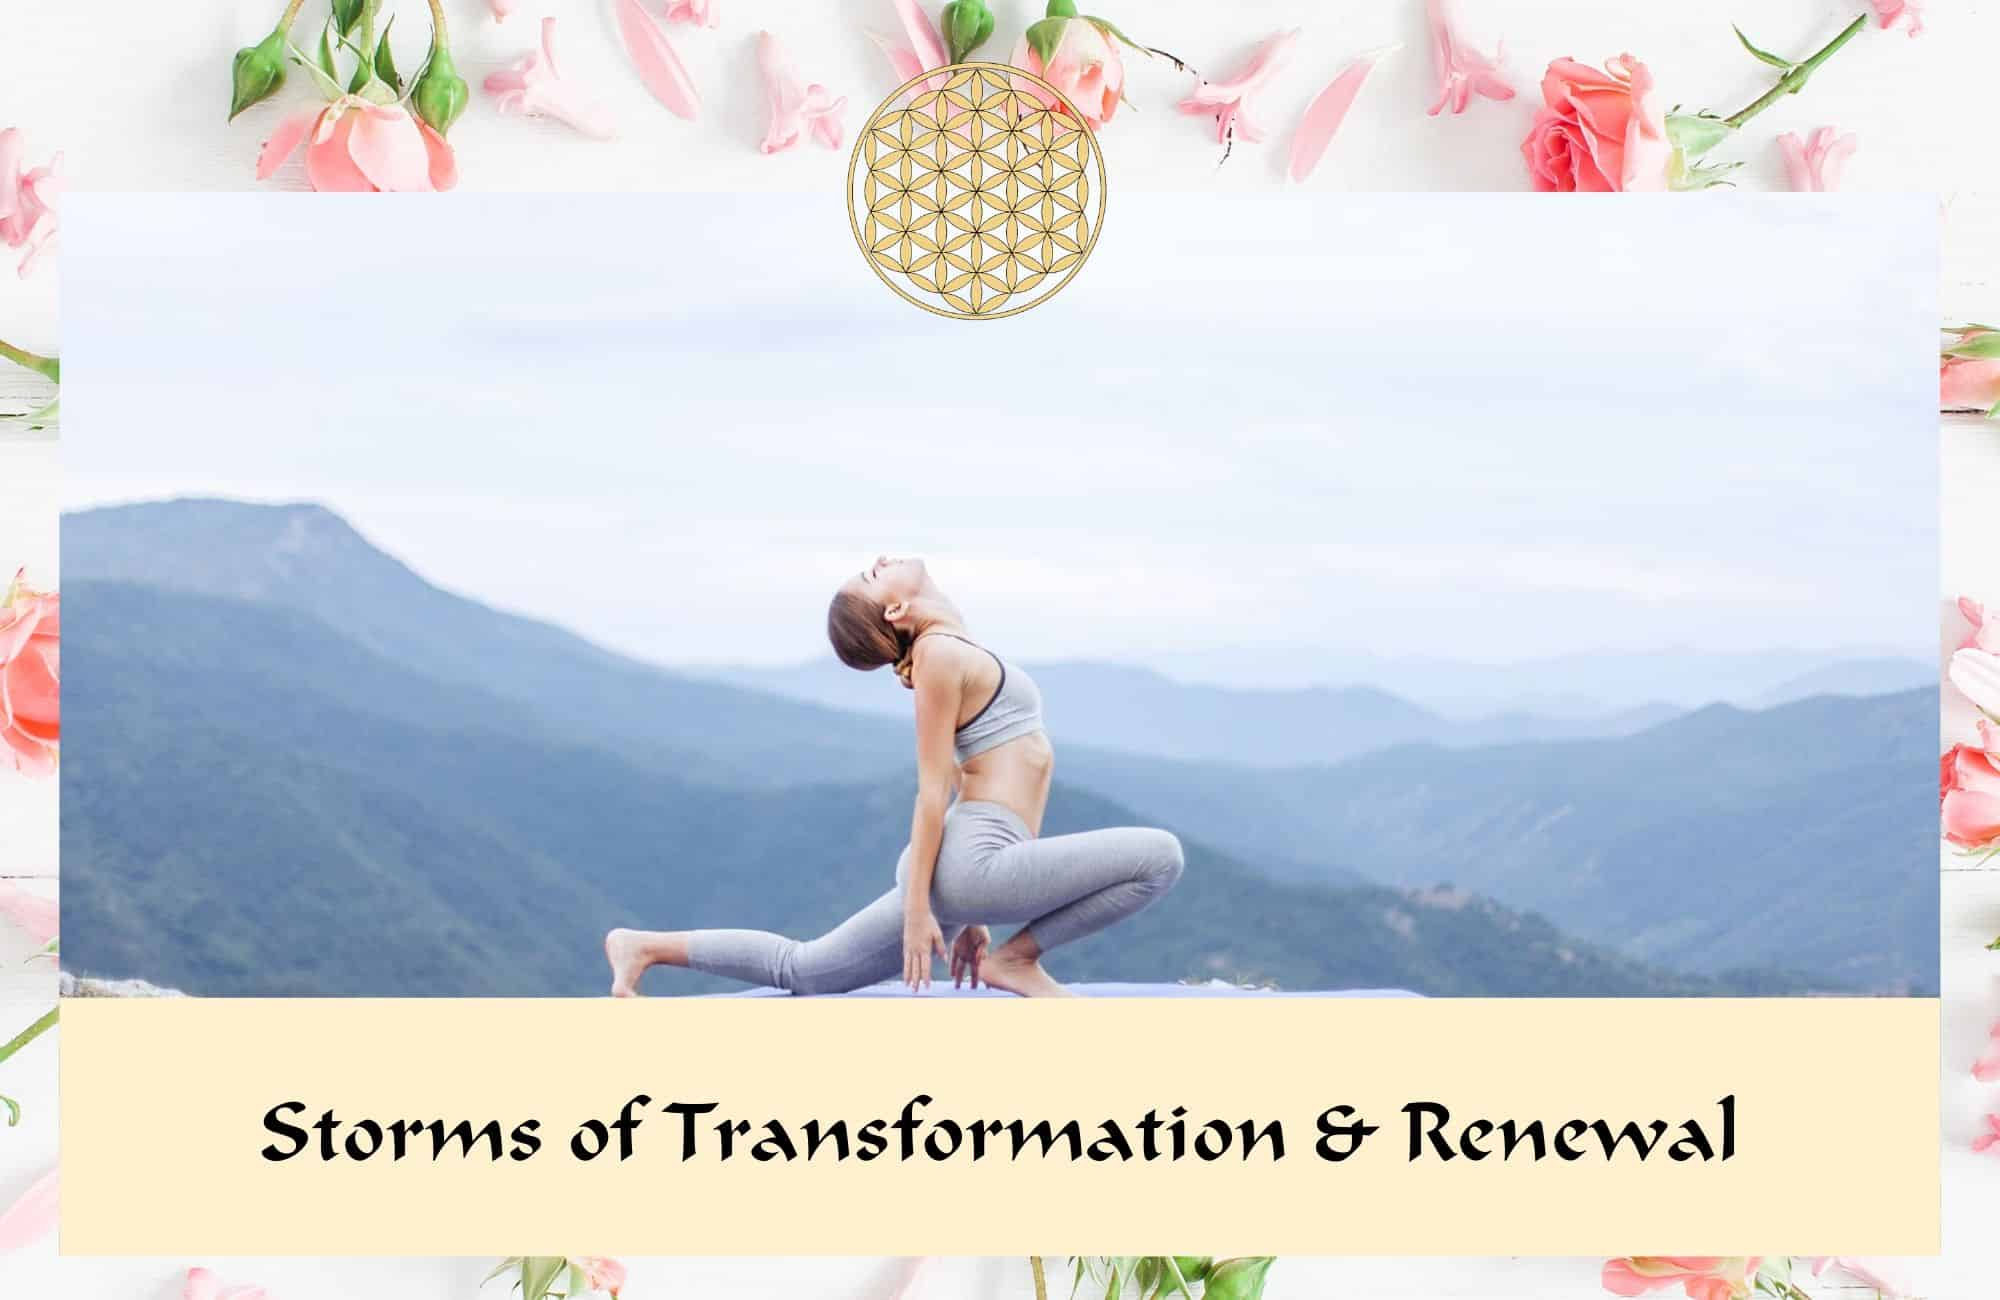 Storms of Transformation & Renewal -